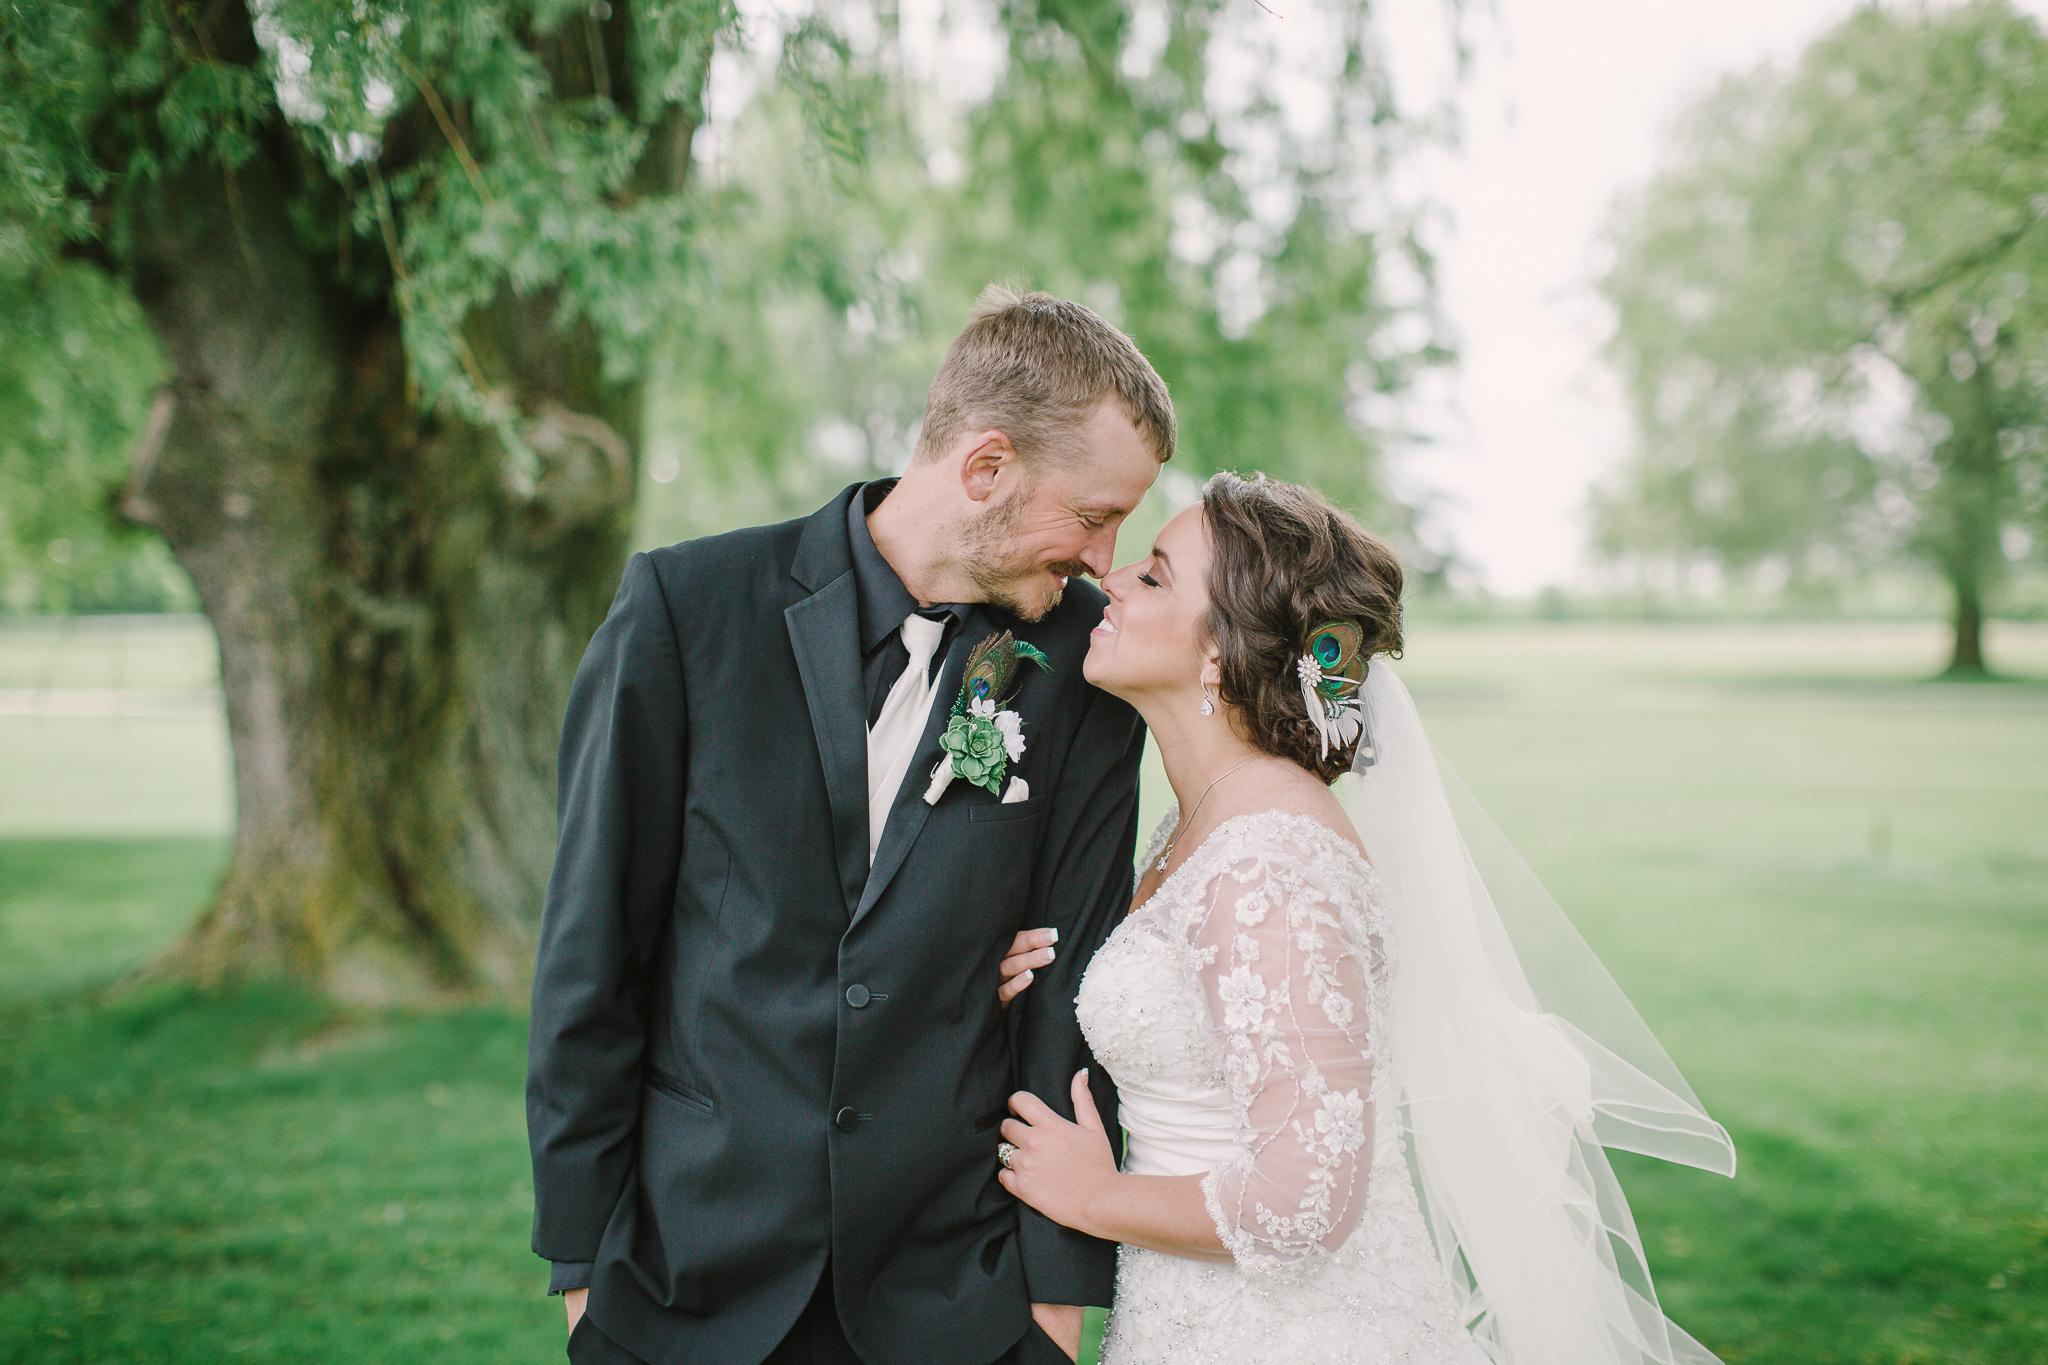 Fox Hills Resort Wedding Photography | Milwaukee WI Photographers |www.karenann.photography | Green Bay | Door County | Madison | Destination | Wedding Wire The Knot | Wisconsin